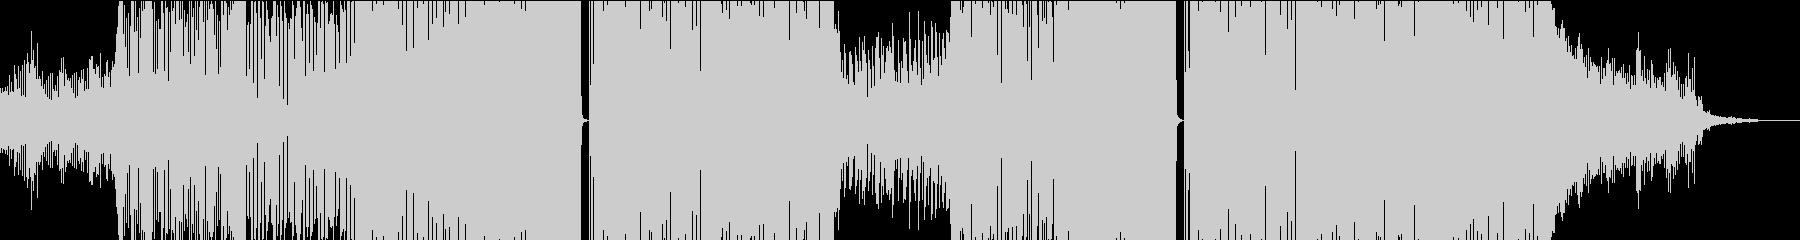 EDM感もある駆け抜けるトランス曲の未再生の波形